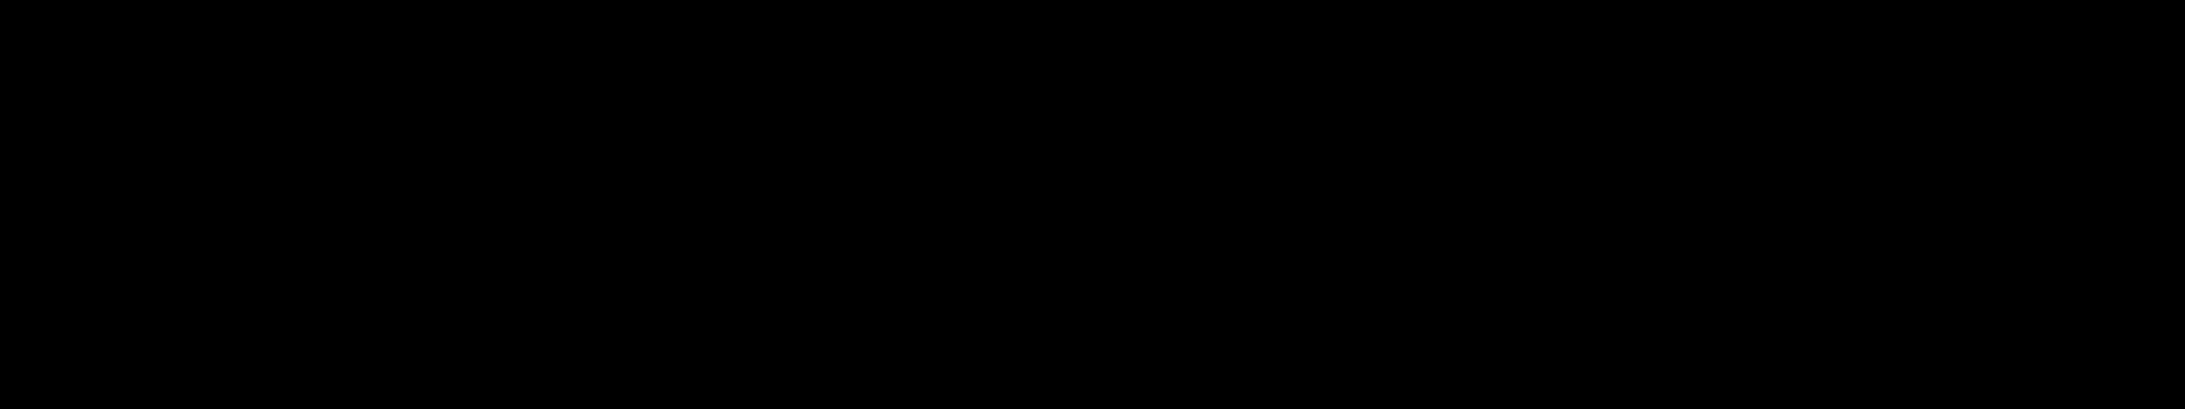 Cece New Logo Transparent.png